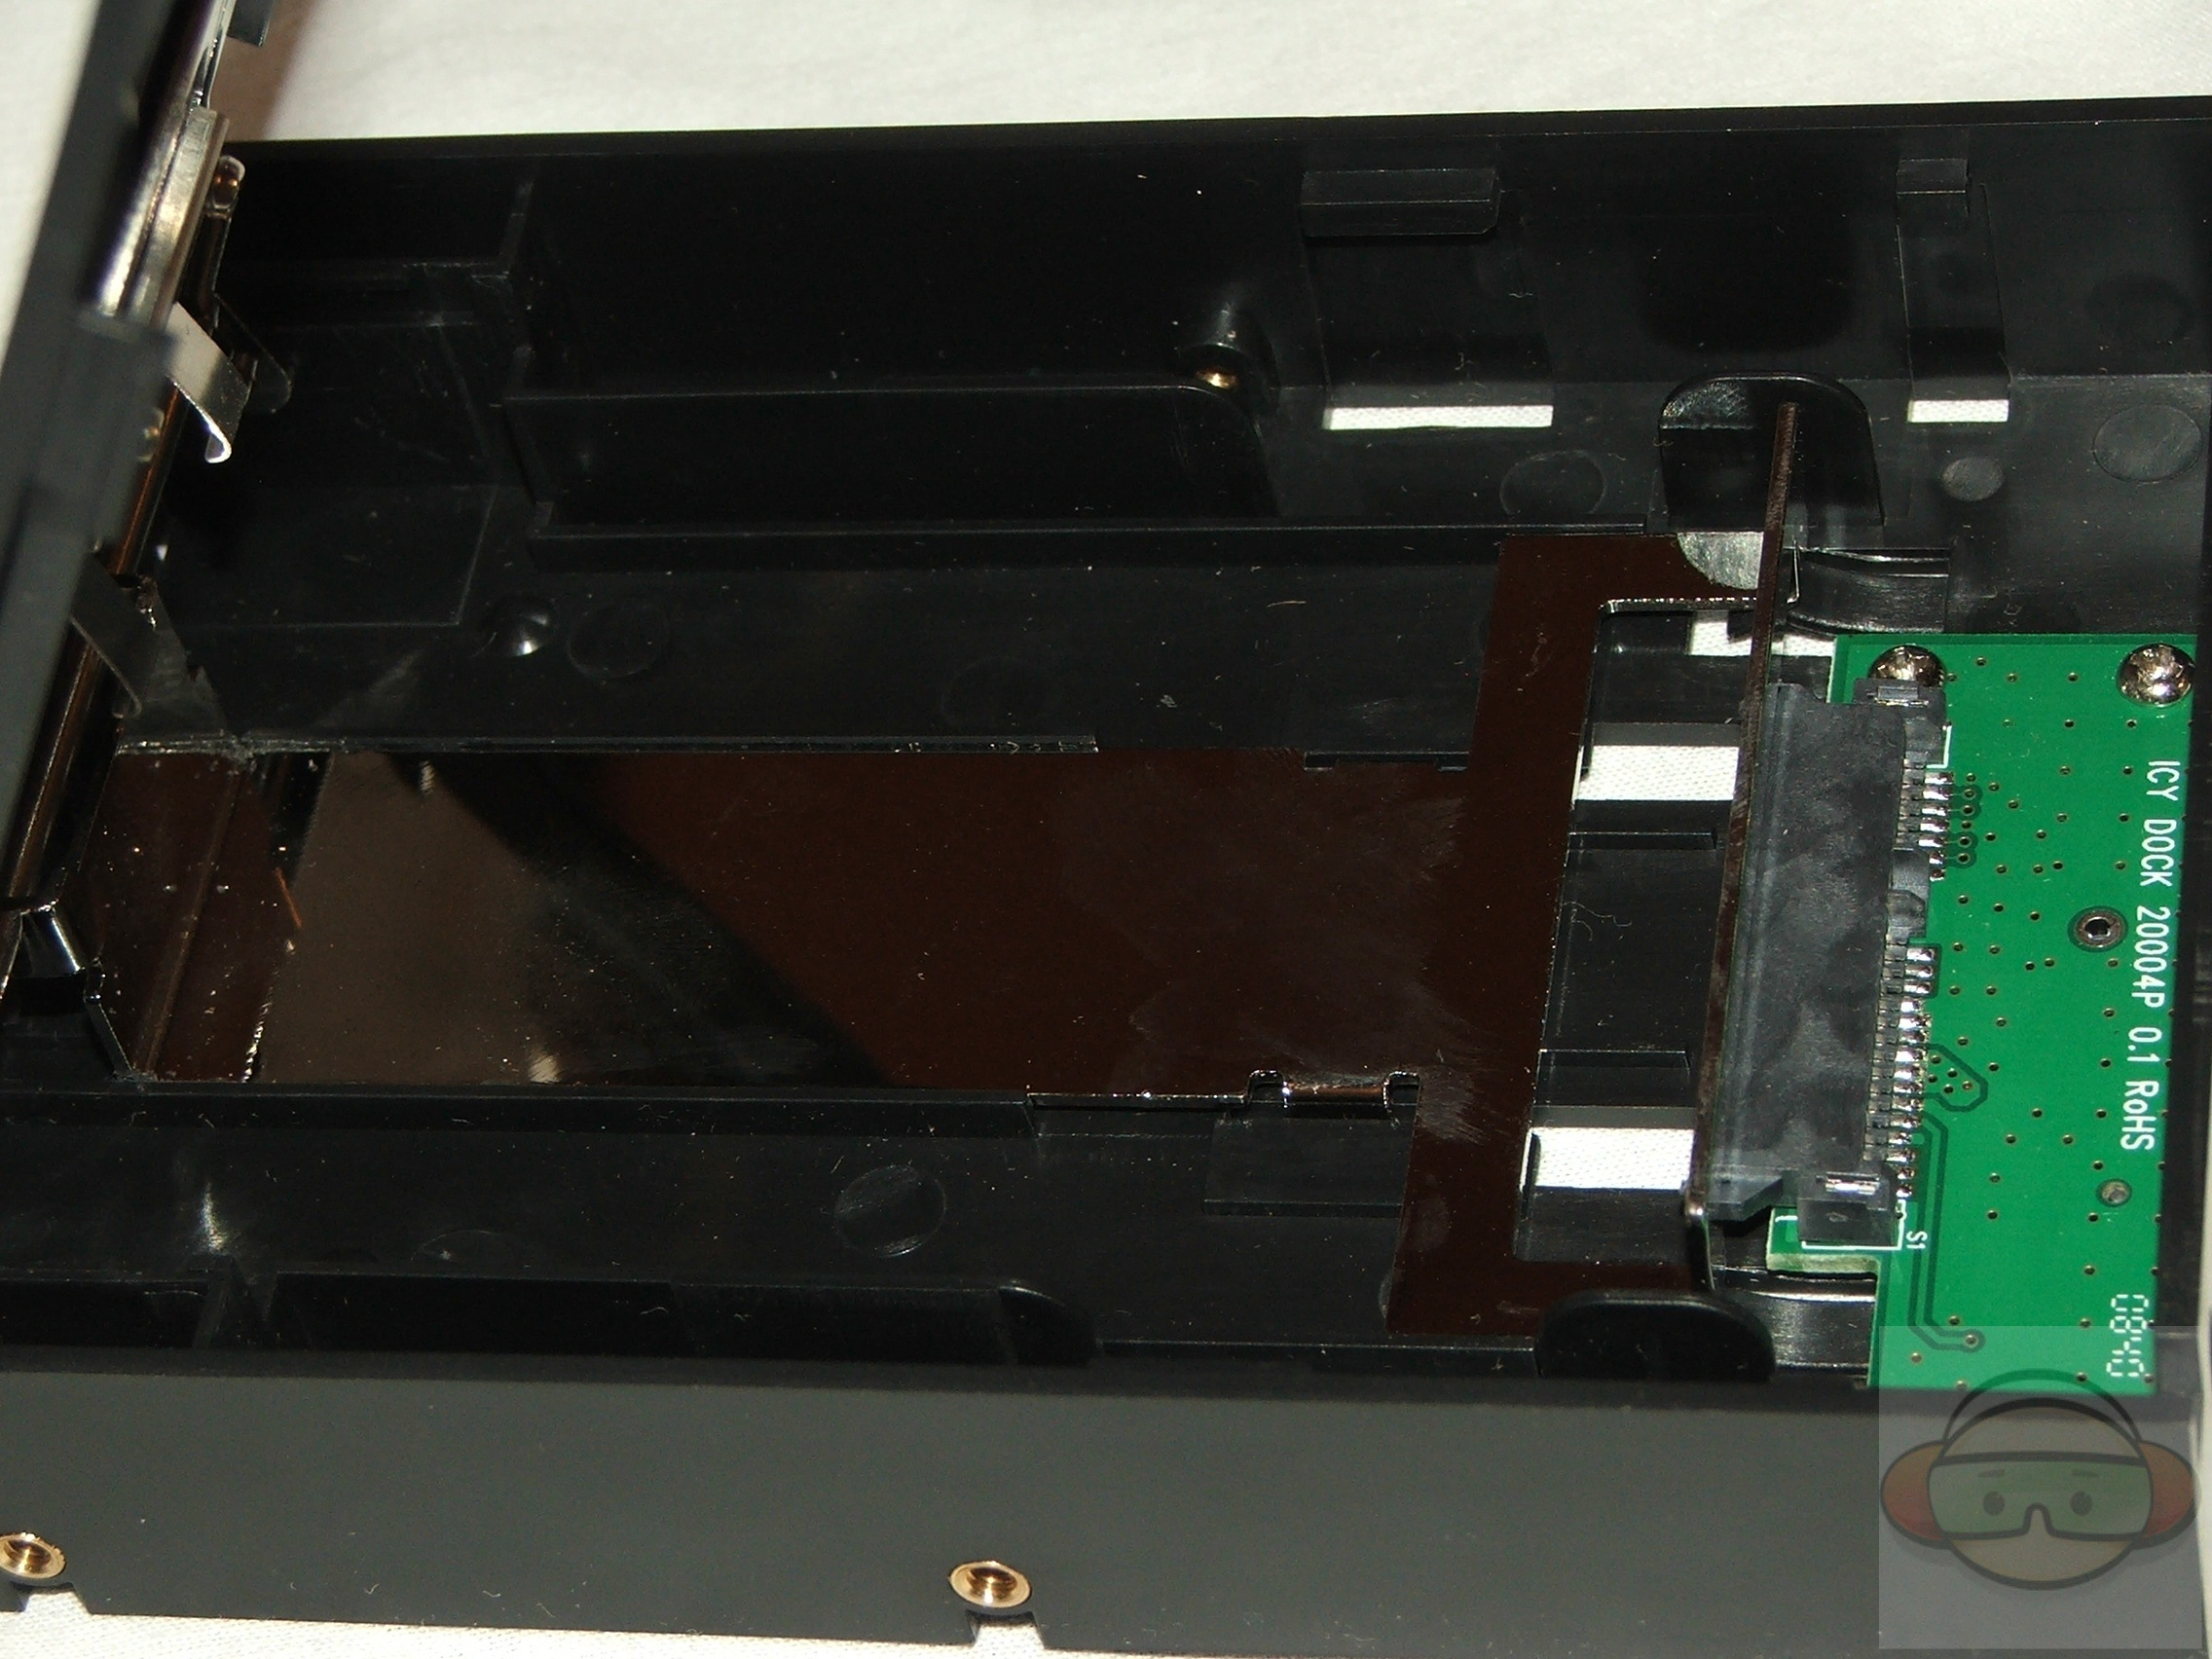 how to convert mac hard drive to windows